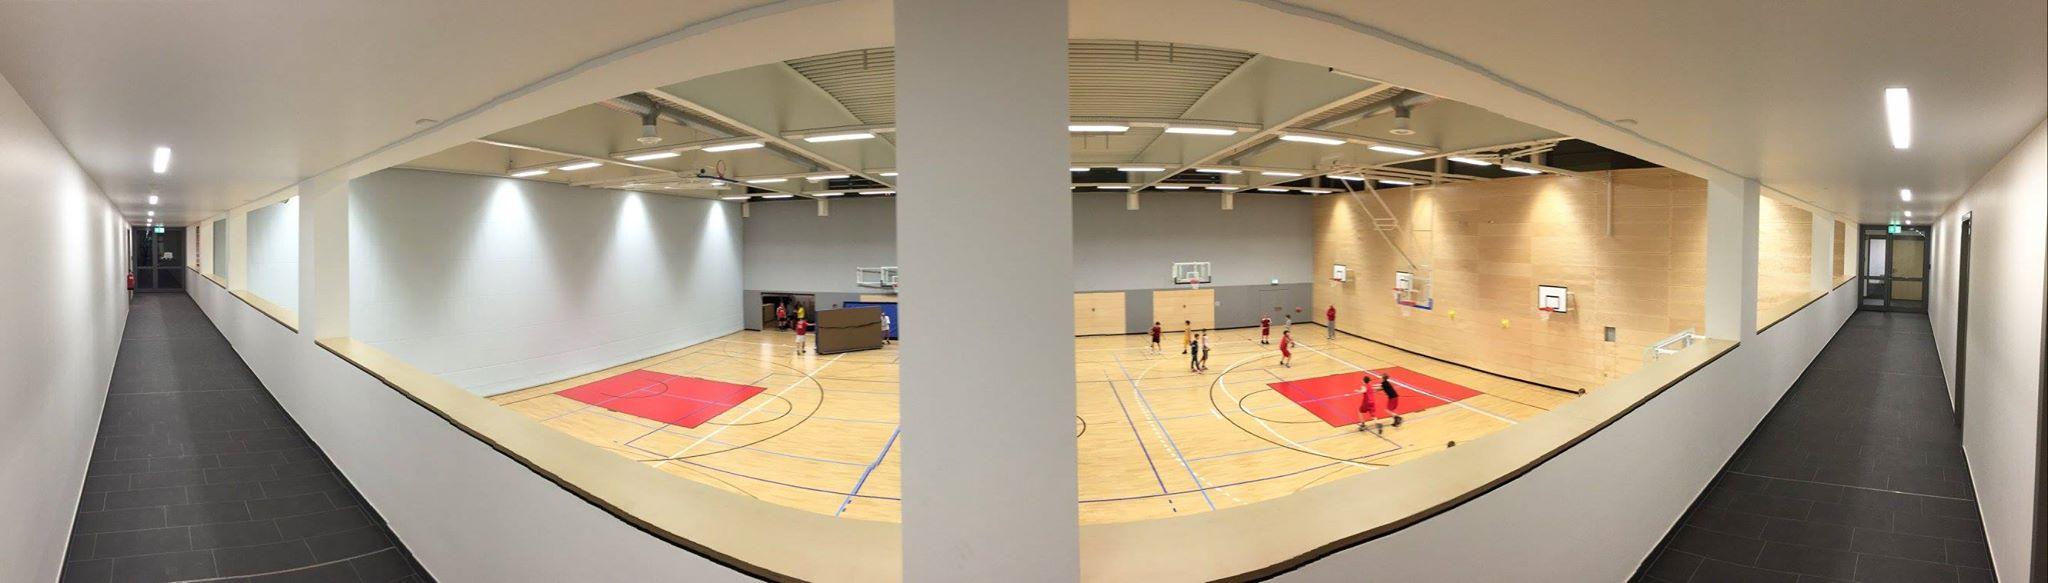 Reismann-Gymnasium Sporthalle